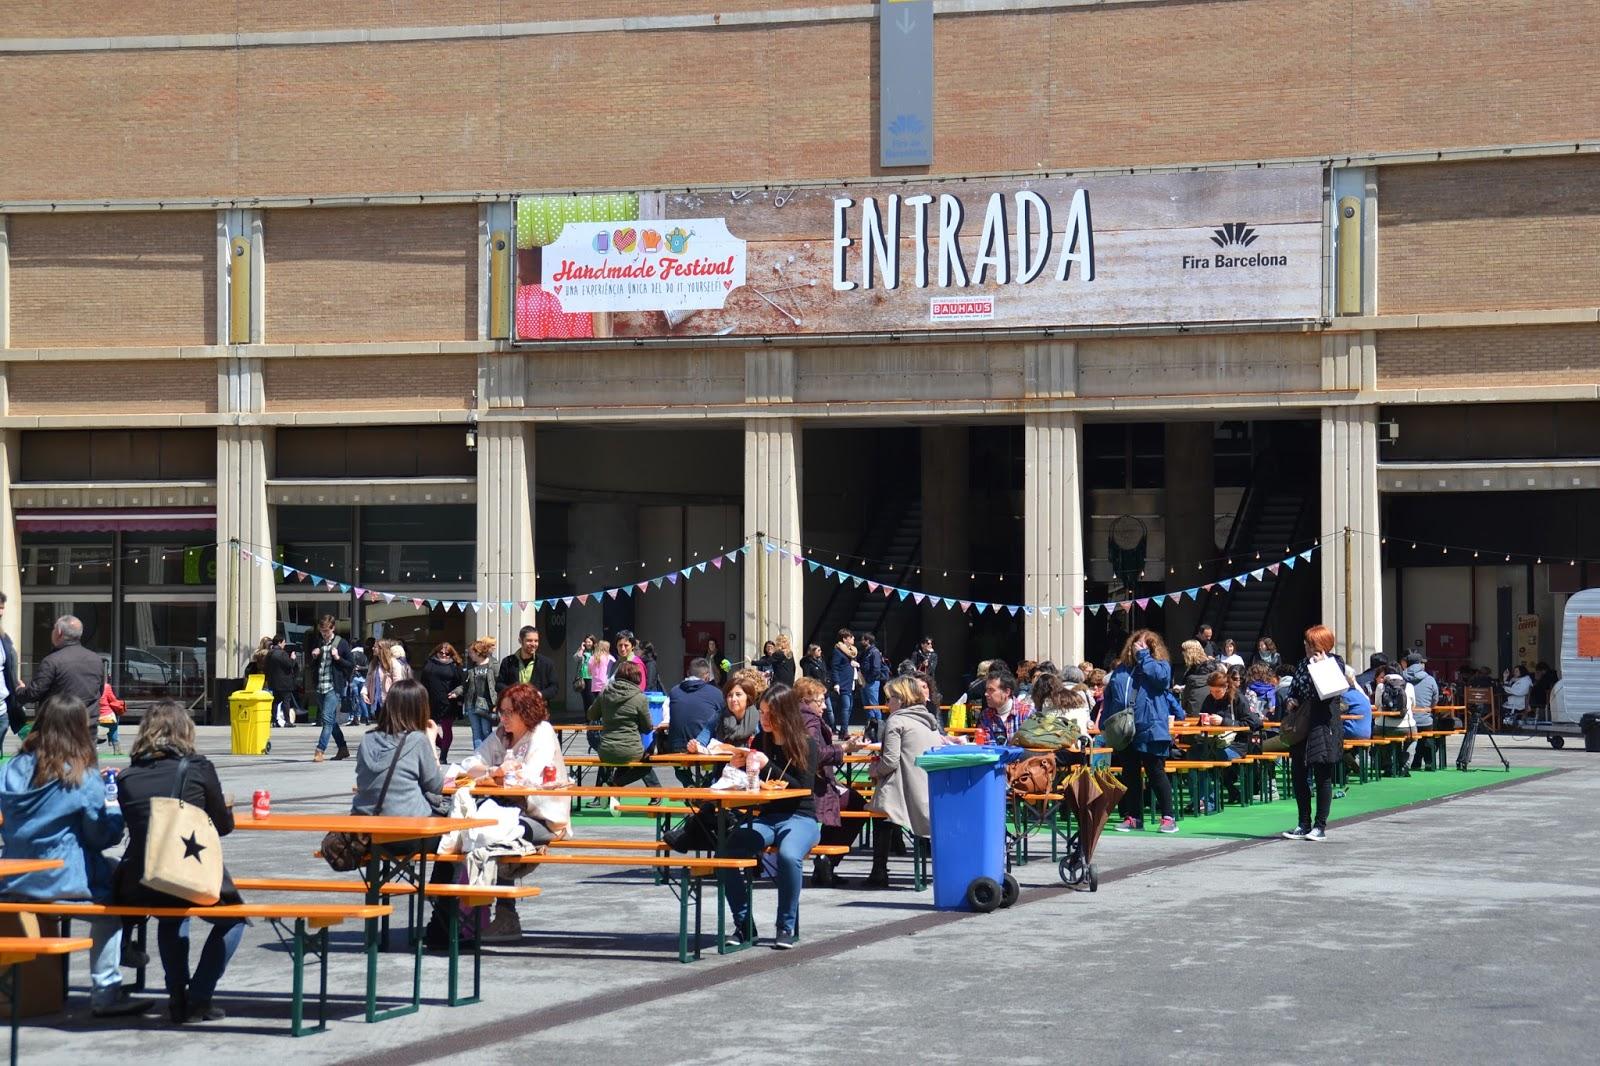 Handmade Festival de Barcelona 1